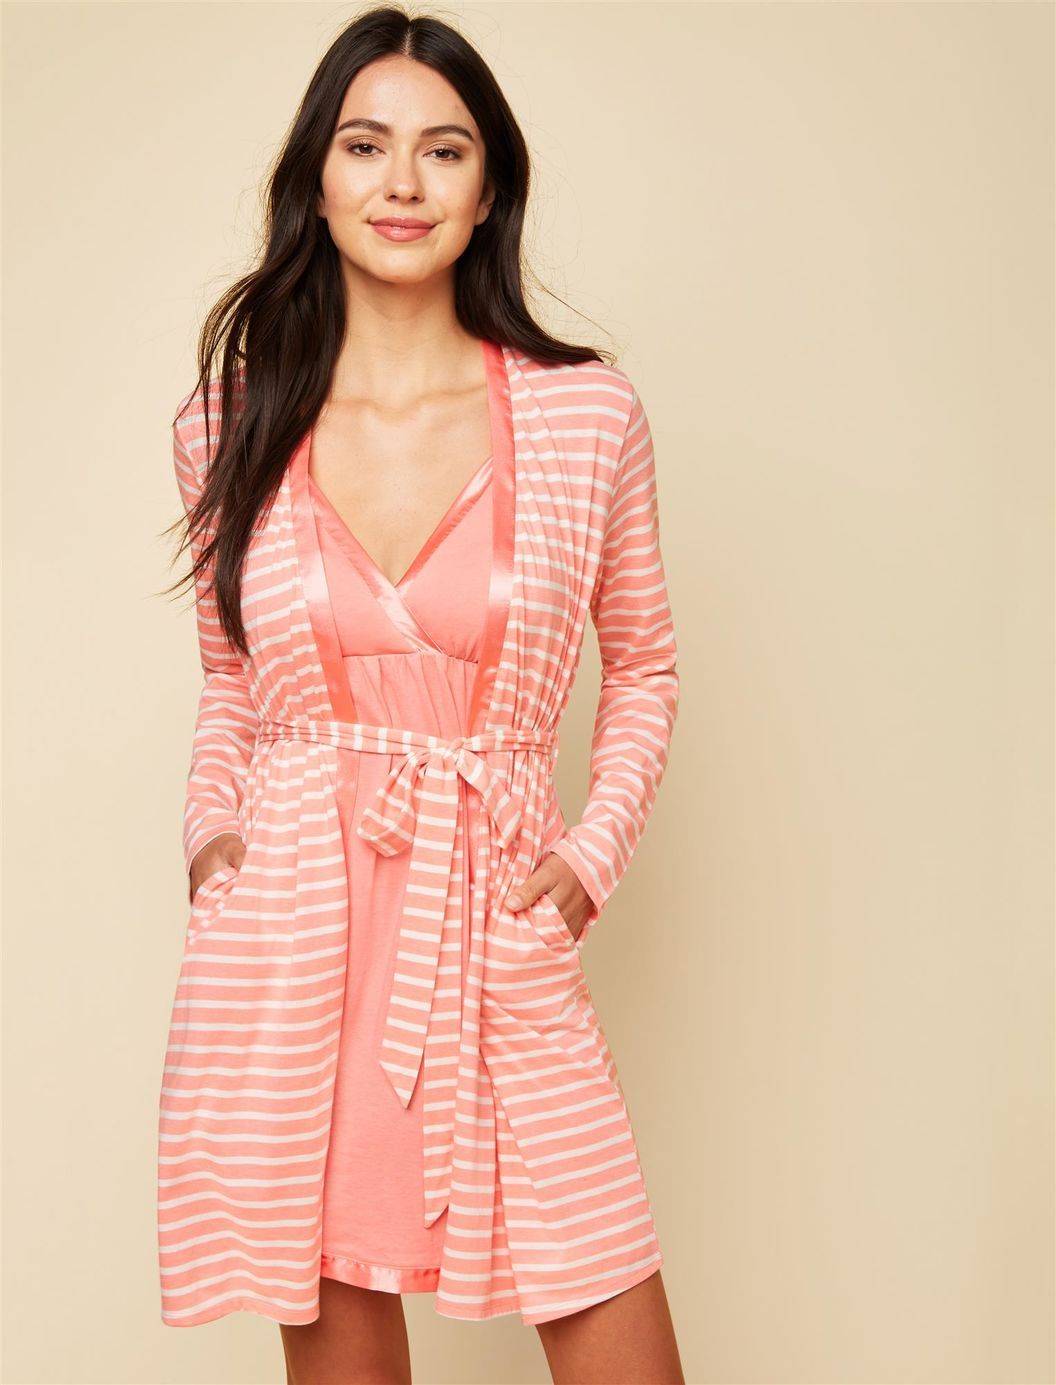 24d141022749d Satin Trim Maternity Nightgown And Robe Set | Motherhood Maternity ...